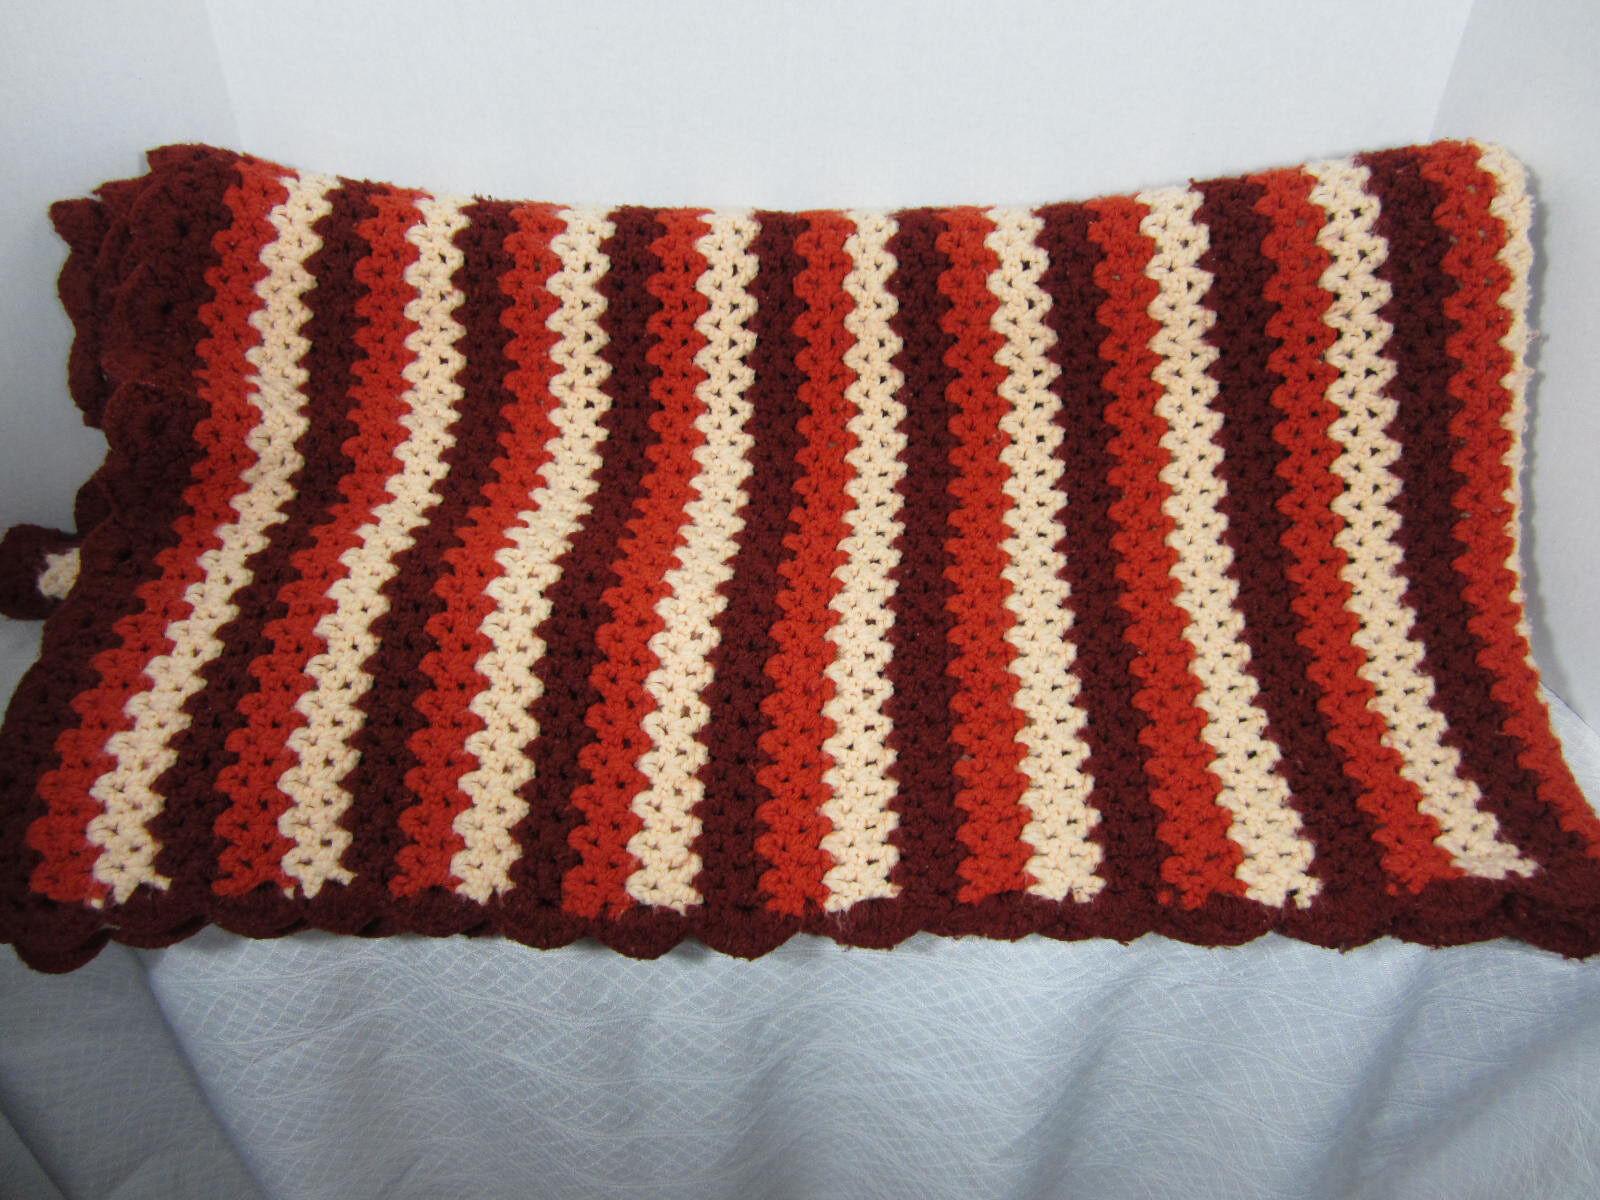 Handmade Crocheted Afghan Sofa Size 76 in X 63.5 in 193 cm 158cm Acrylic EPOC